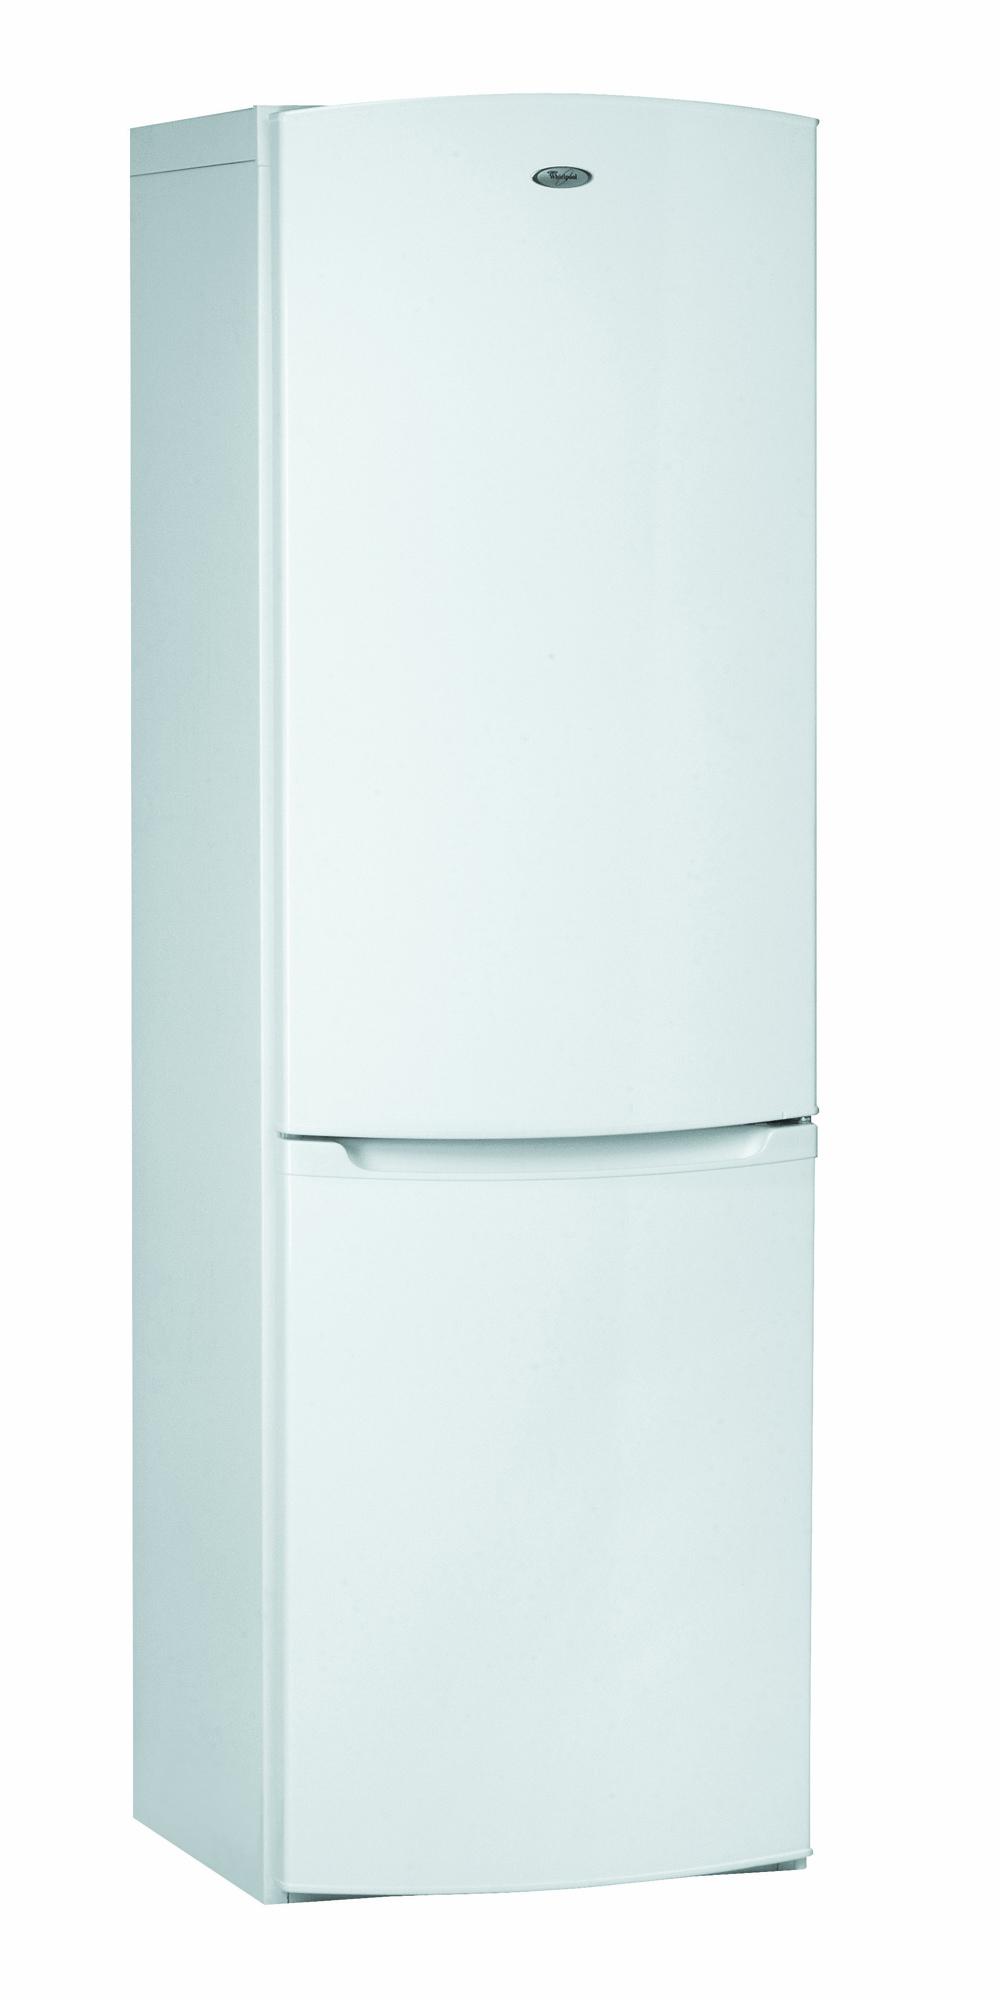 Whirlpool WBE 3321 A+ NFW Fritstående køle-fryseskab